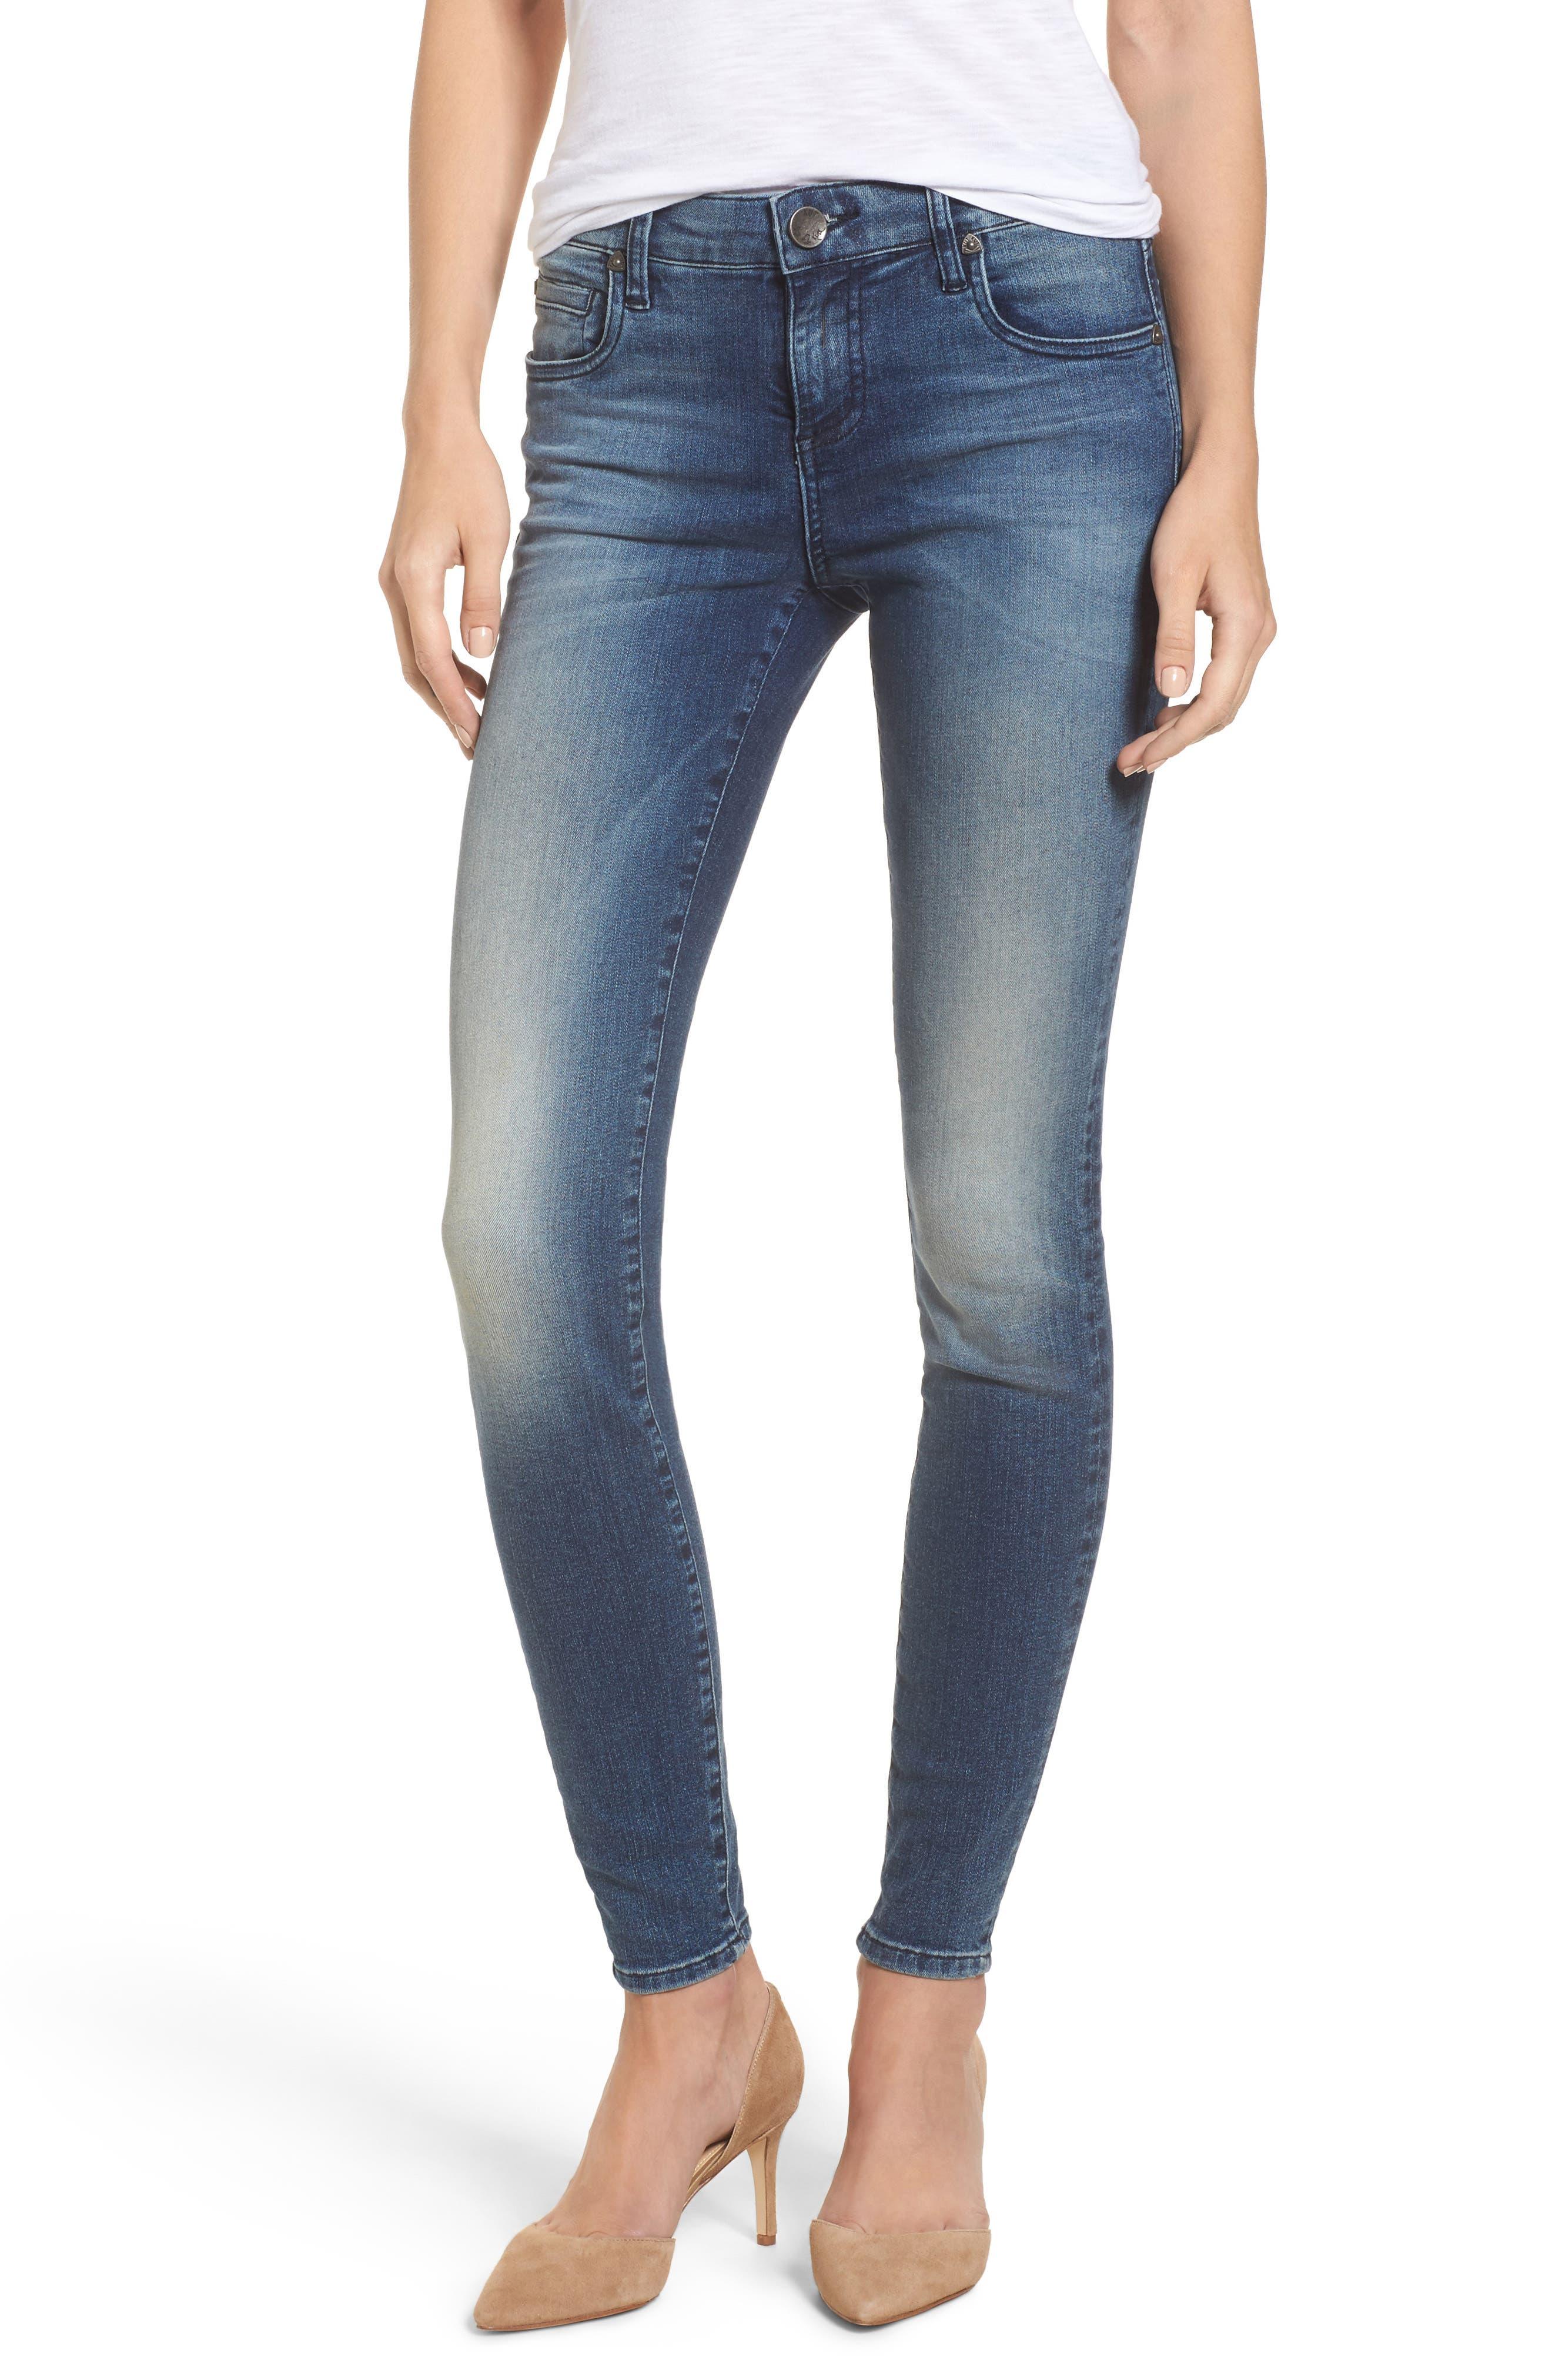 Main Image - KUT from the Kloth Donna High Waist Jeans (Cheered) (Regular & Petite)